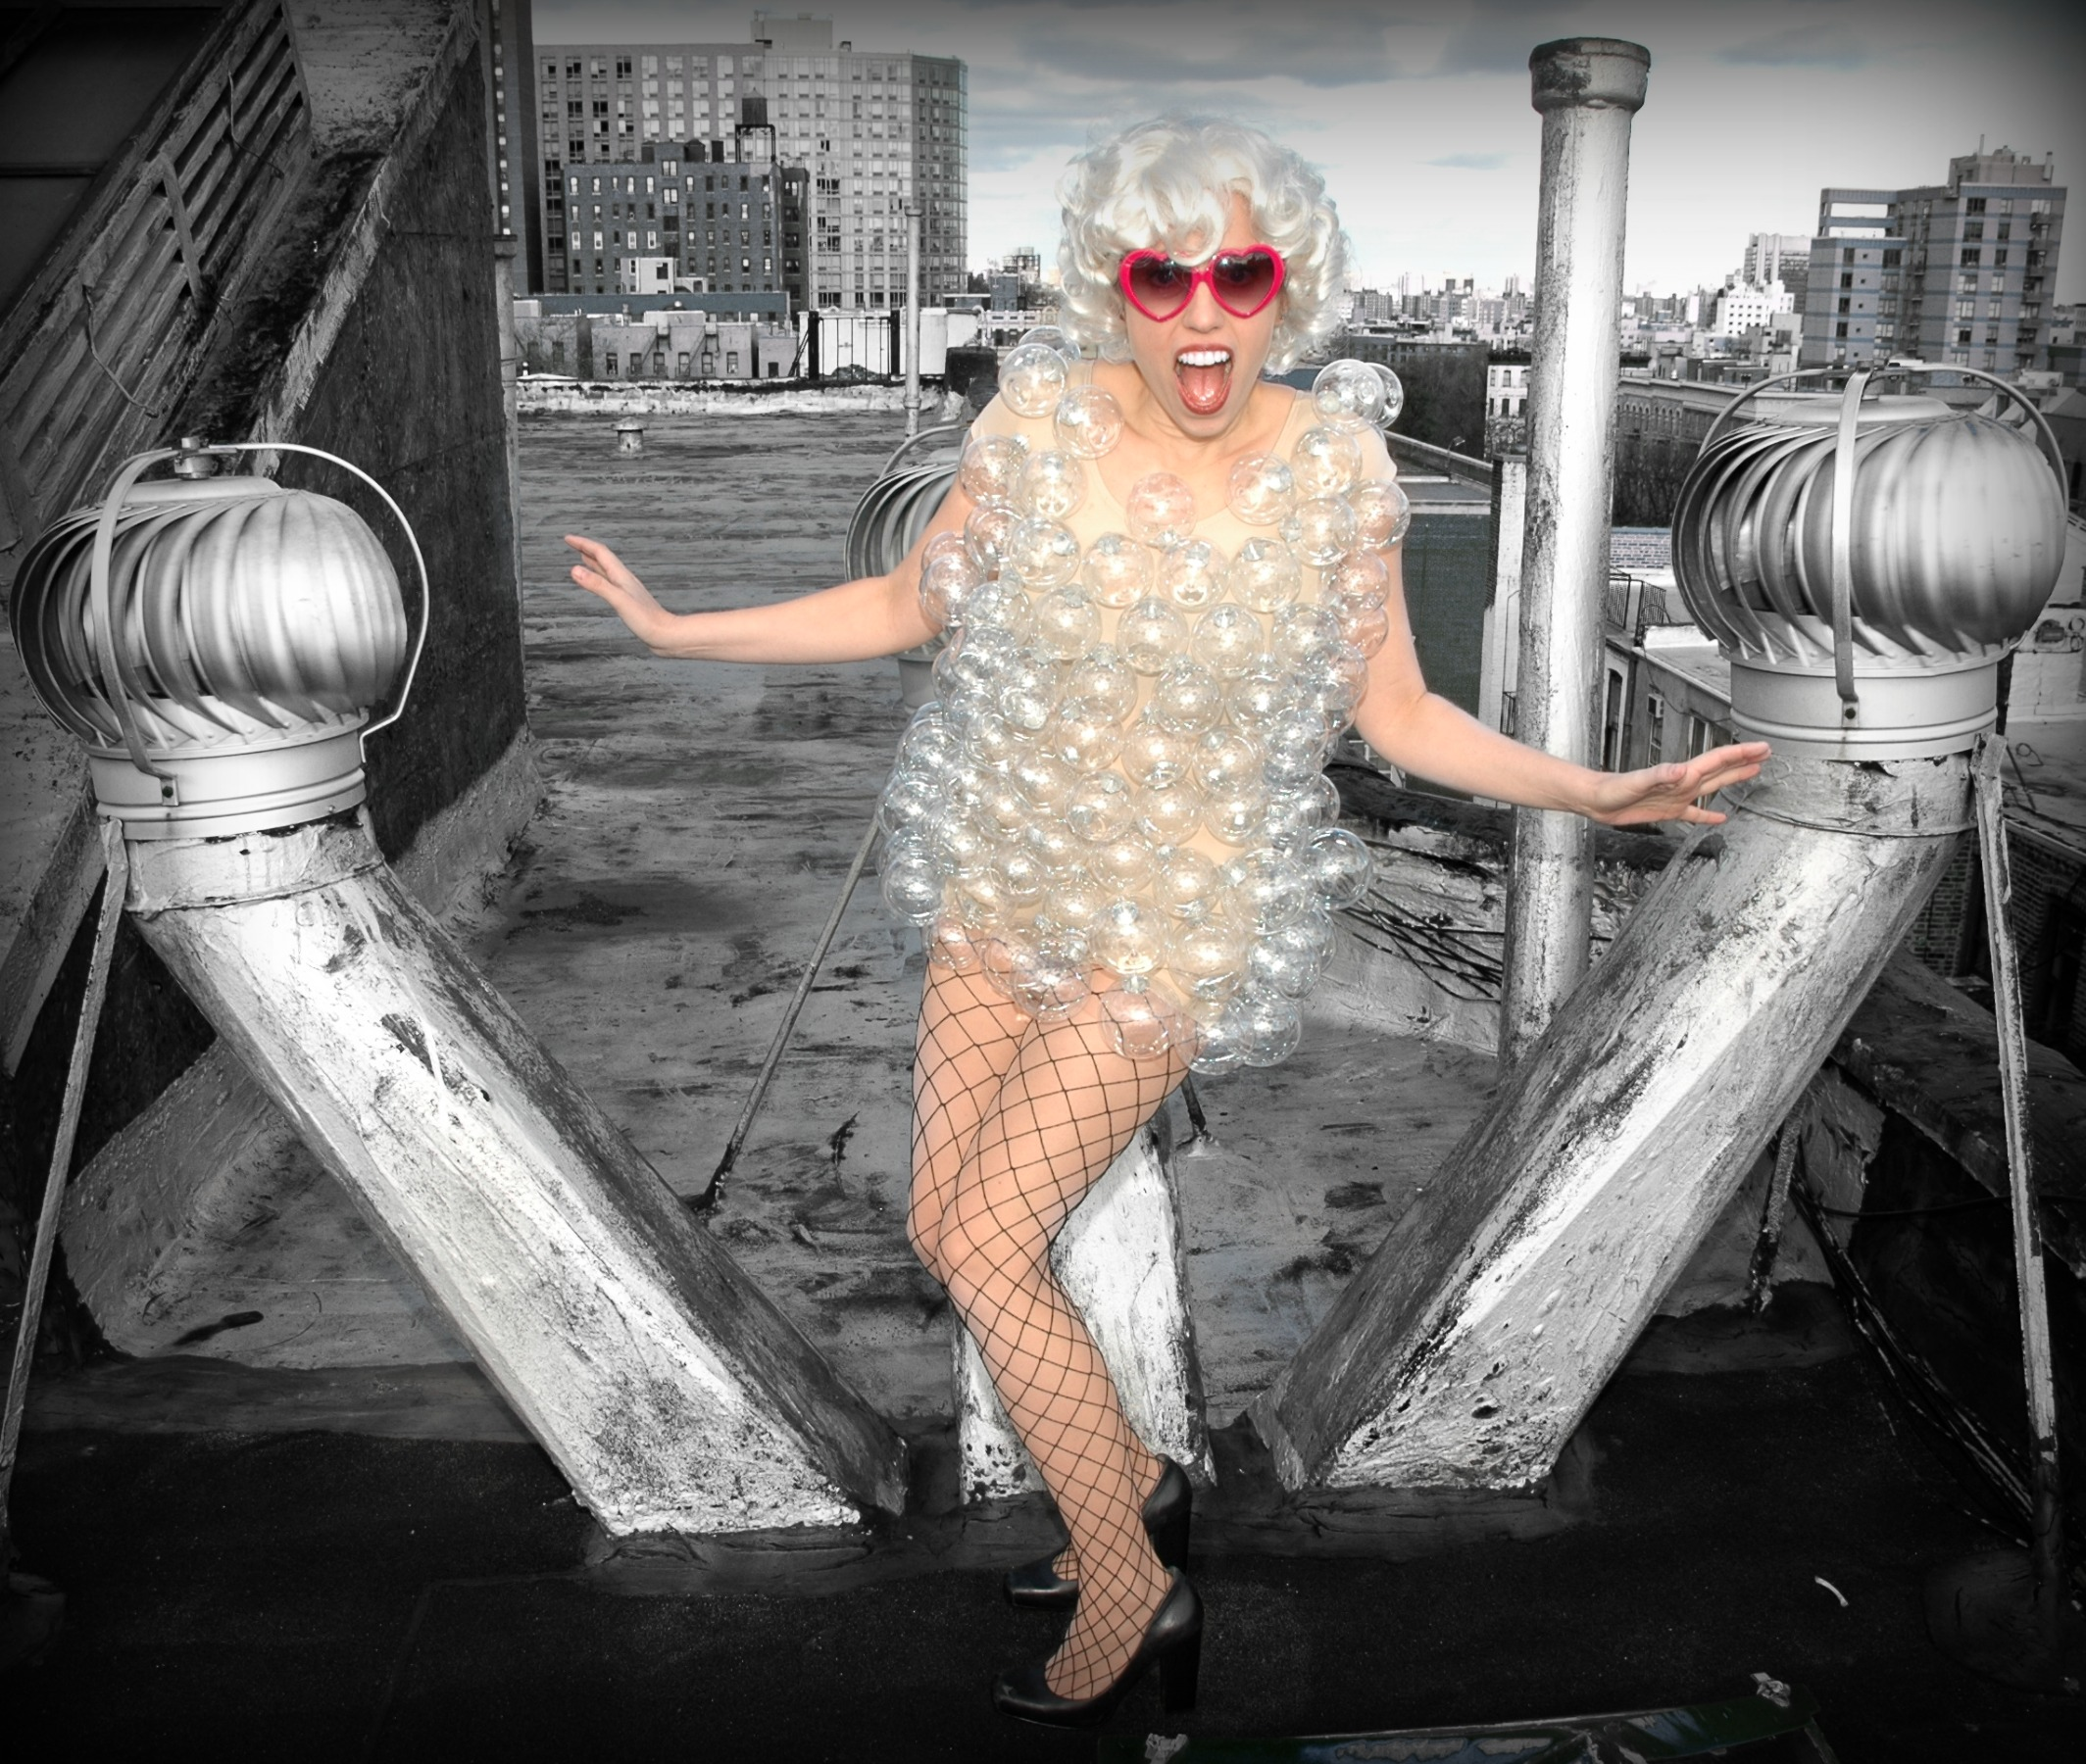 Athena as Gaga in Bubble Dress